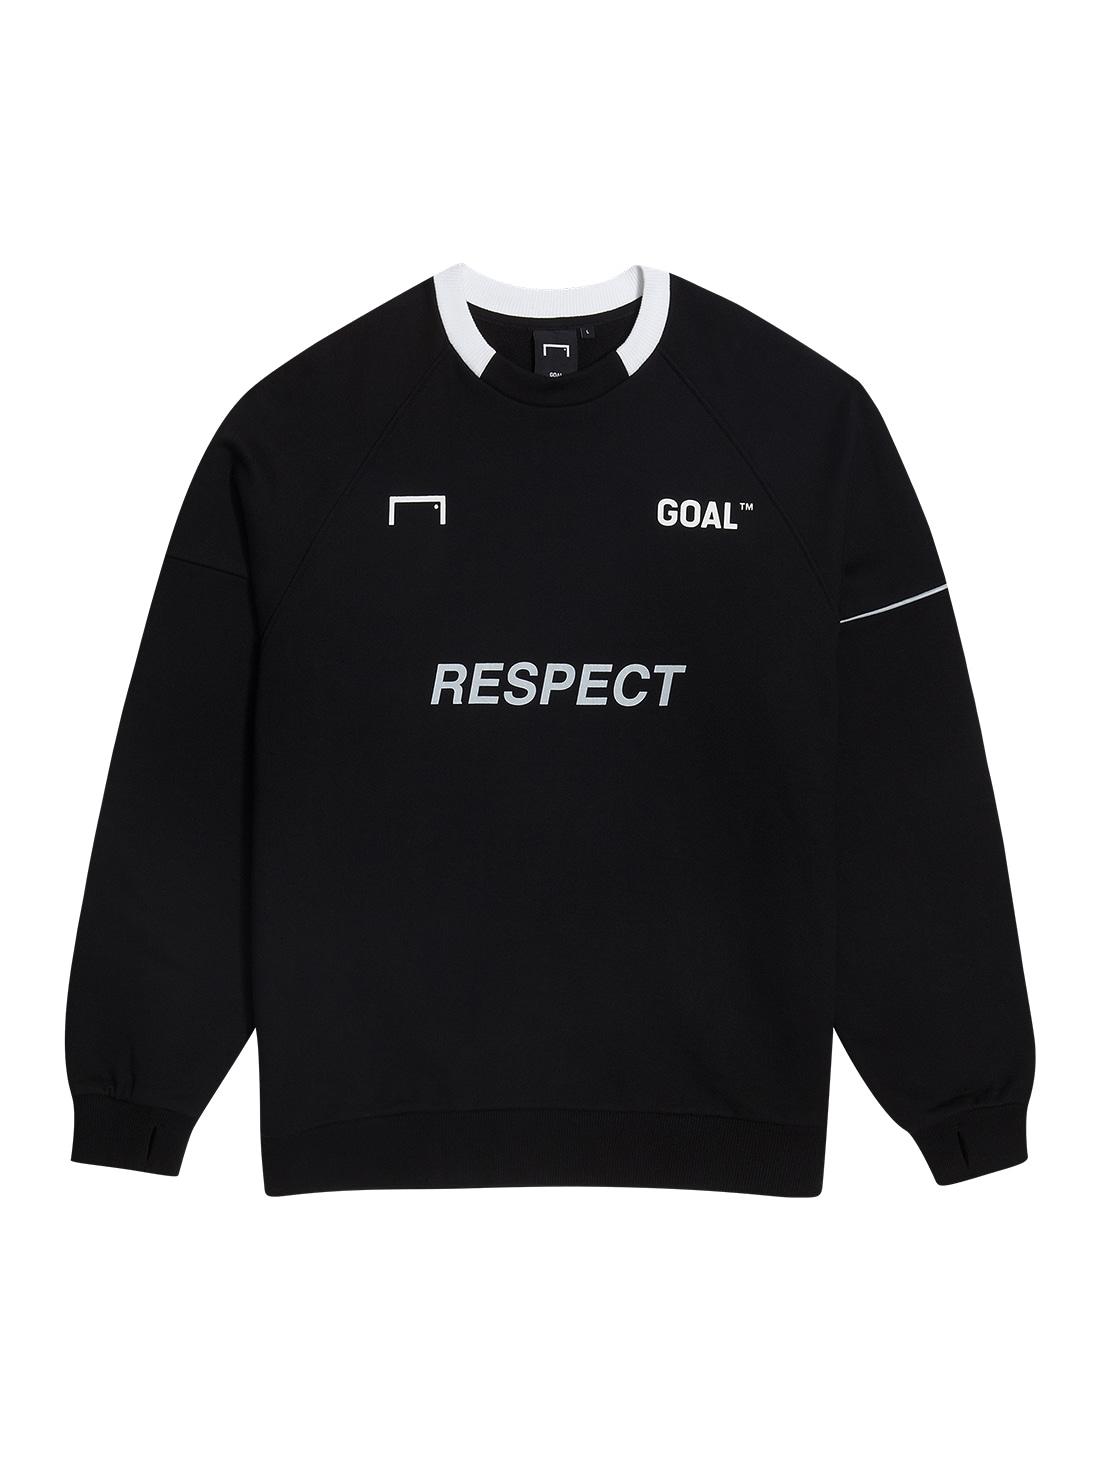 GOALSTUDIO (Sold Out) RESPECT SWEATSHIRT - BLACK